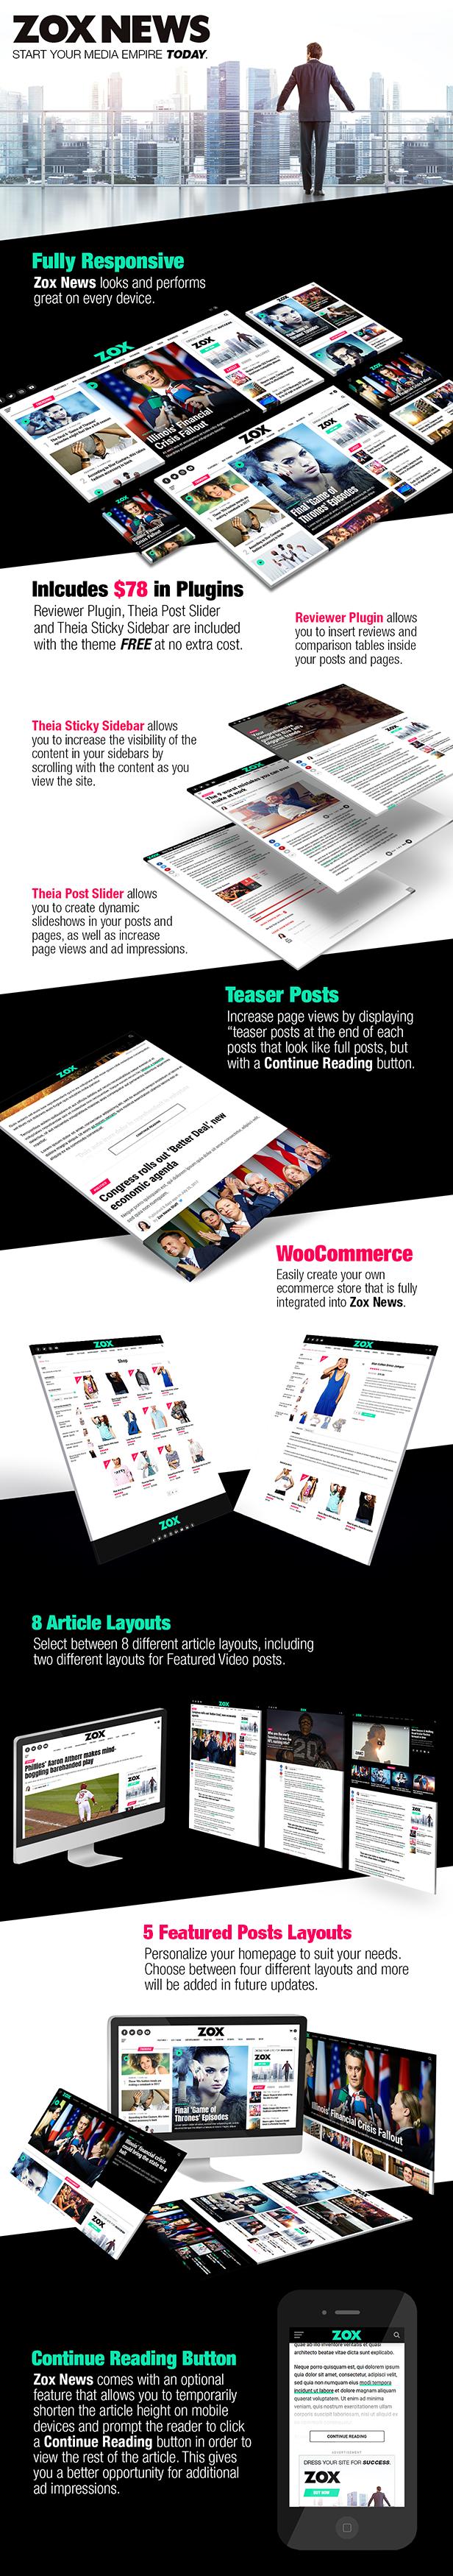 zox landing4 - Zox News - Professional WordPress News & Magazine Theme